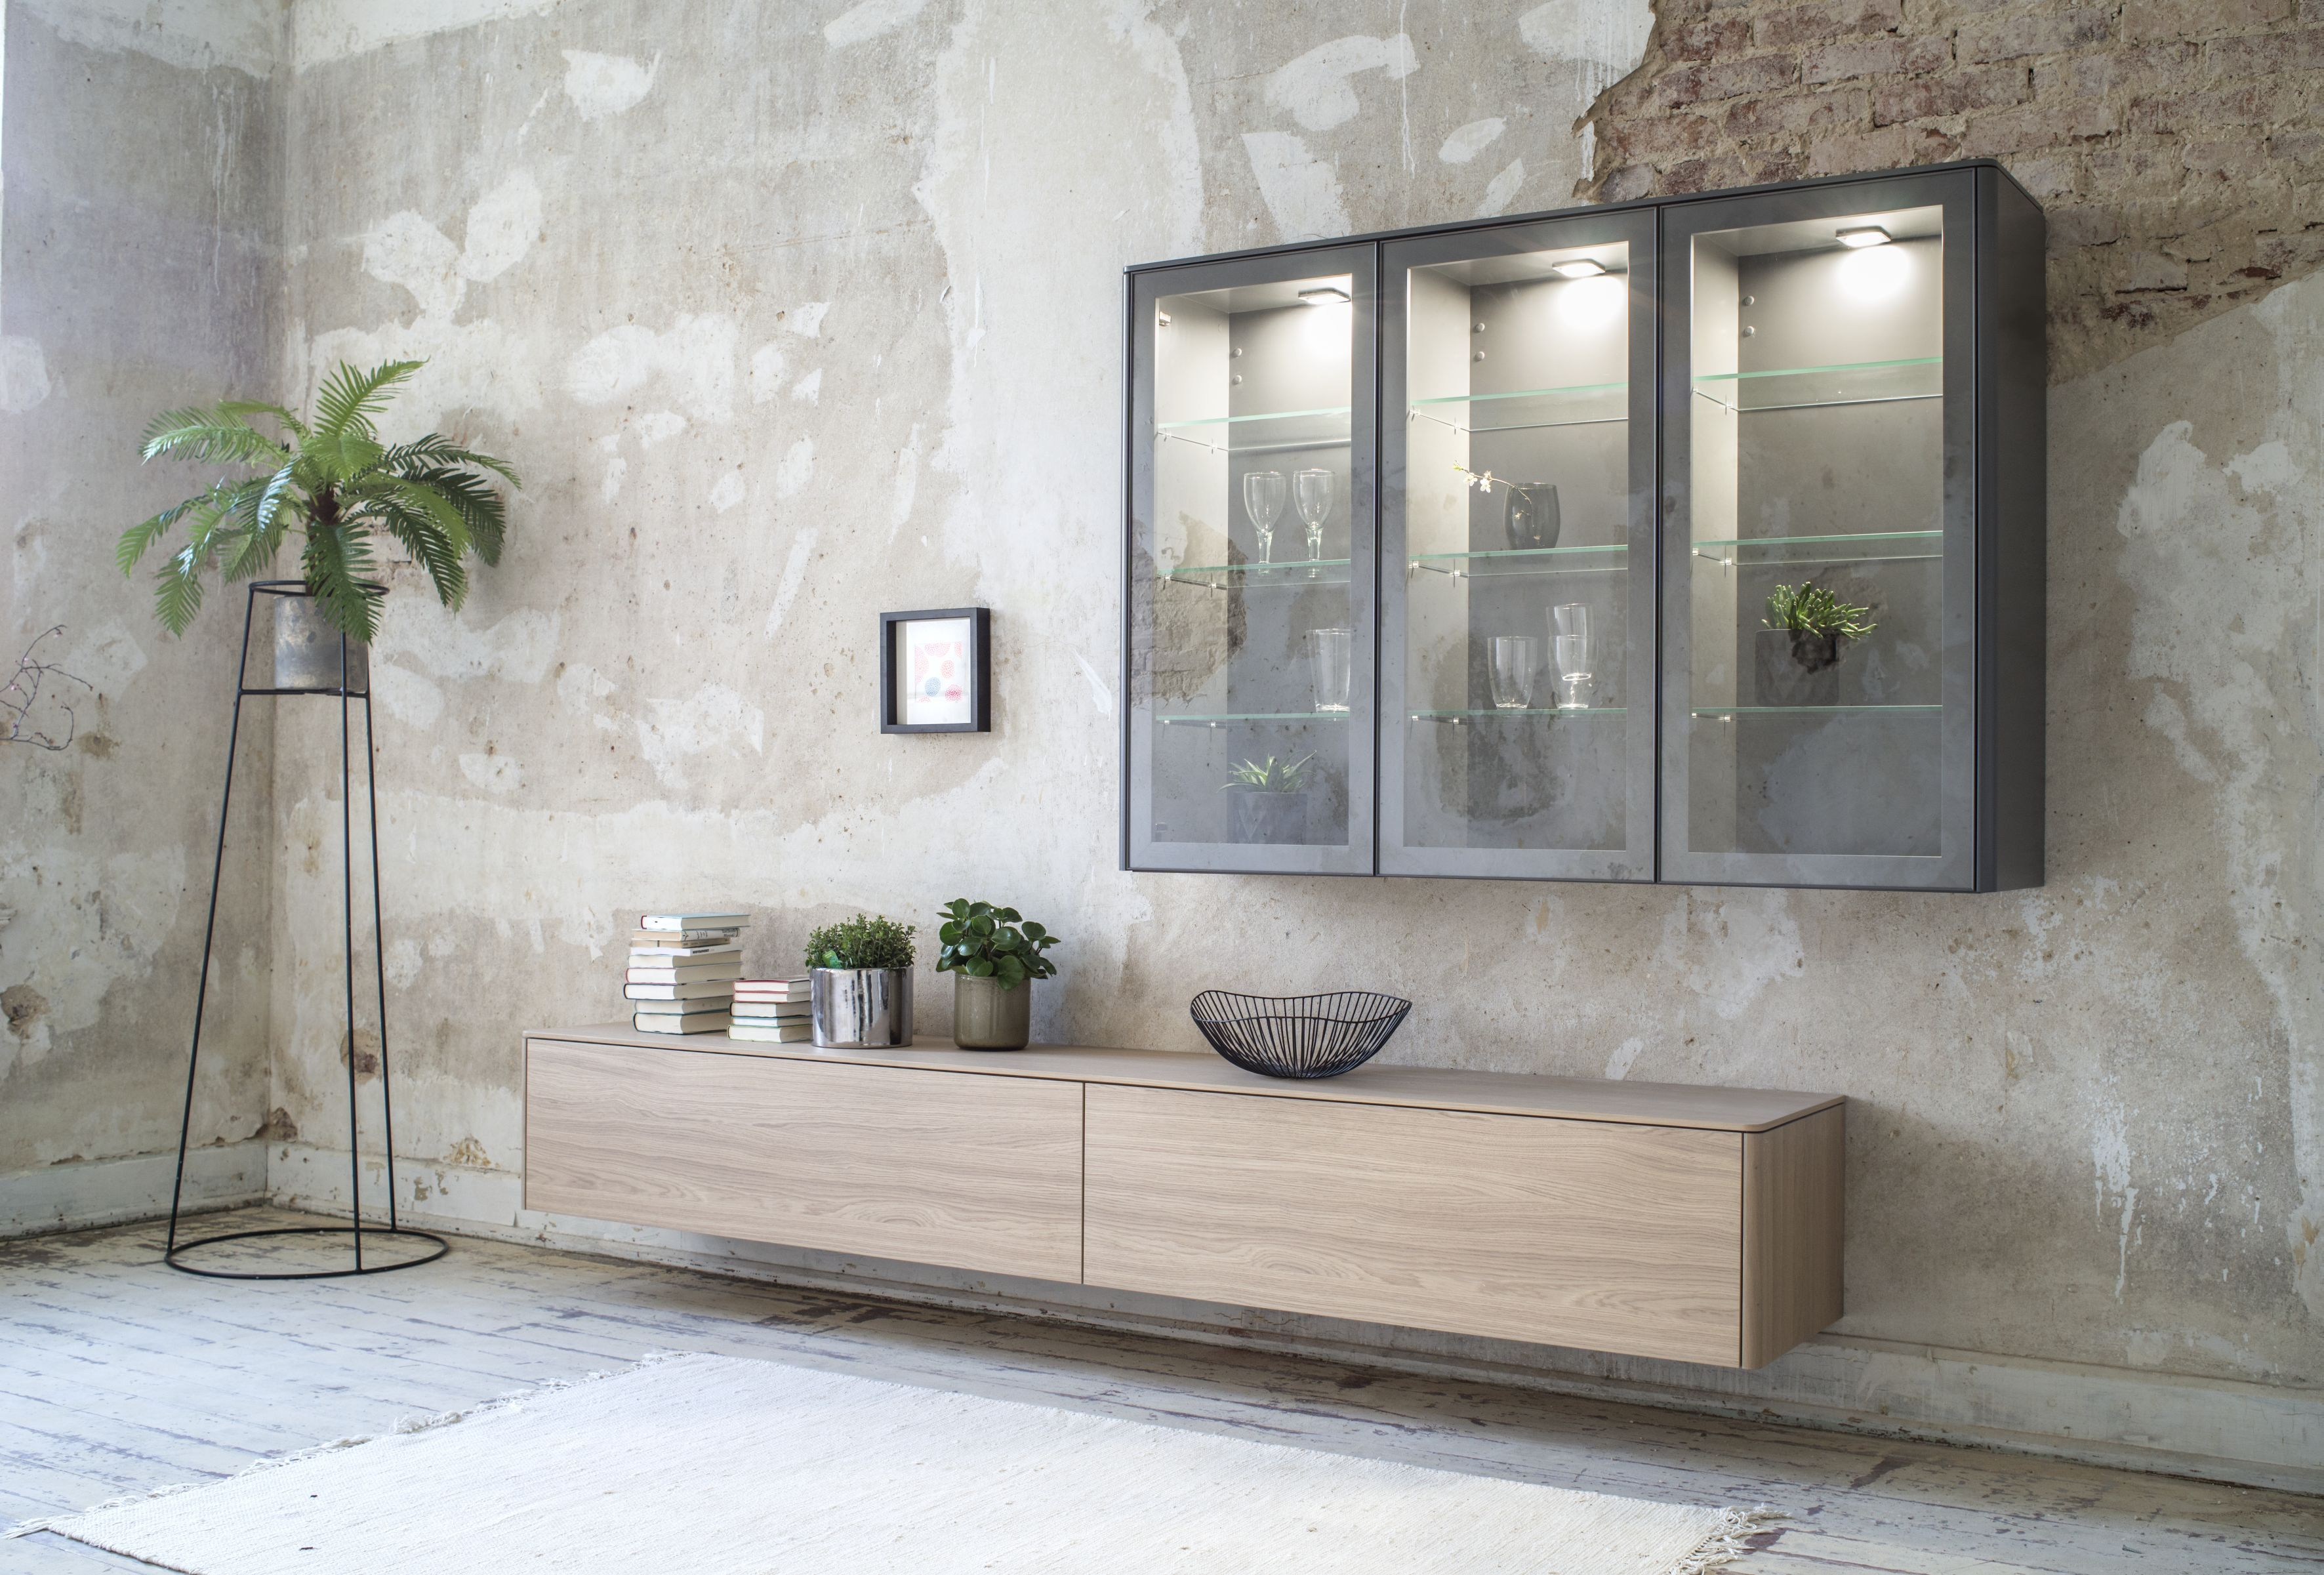 GOYA Sideboard | #Sideboard Aus Glas, Lack Und Edlem Echtholzfurnier. #Holz  #